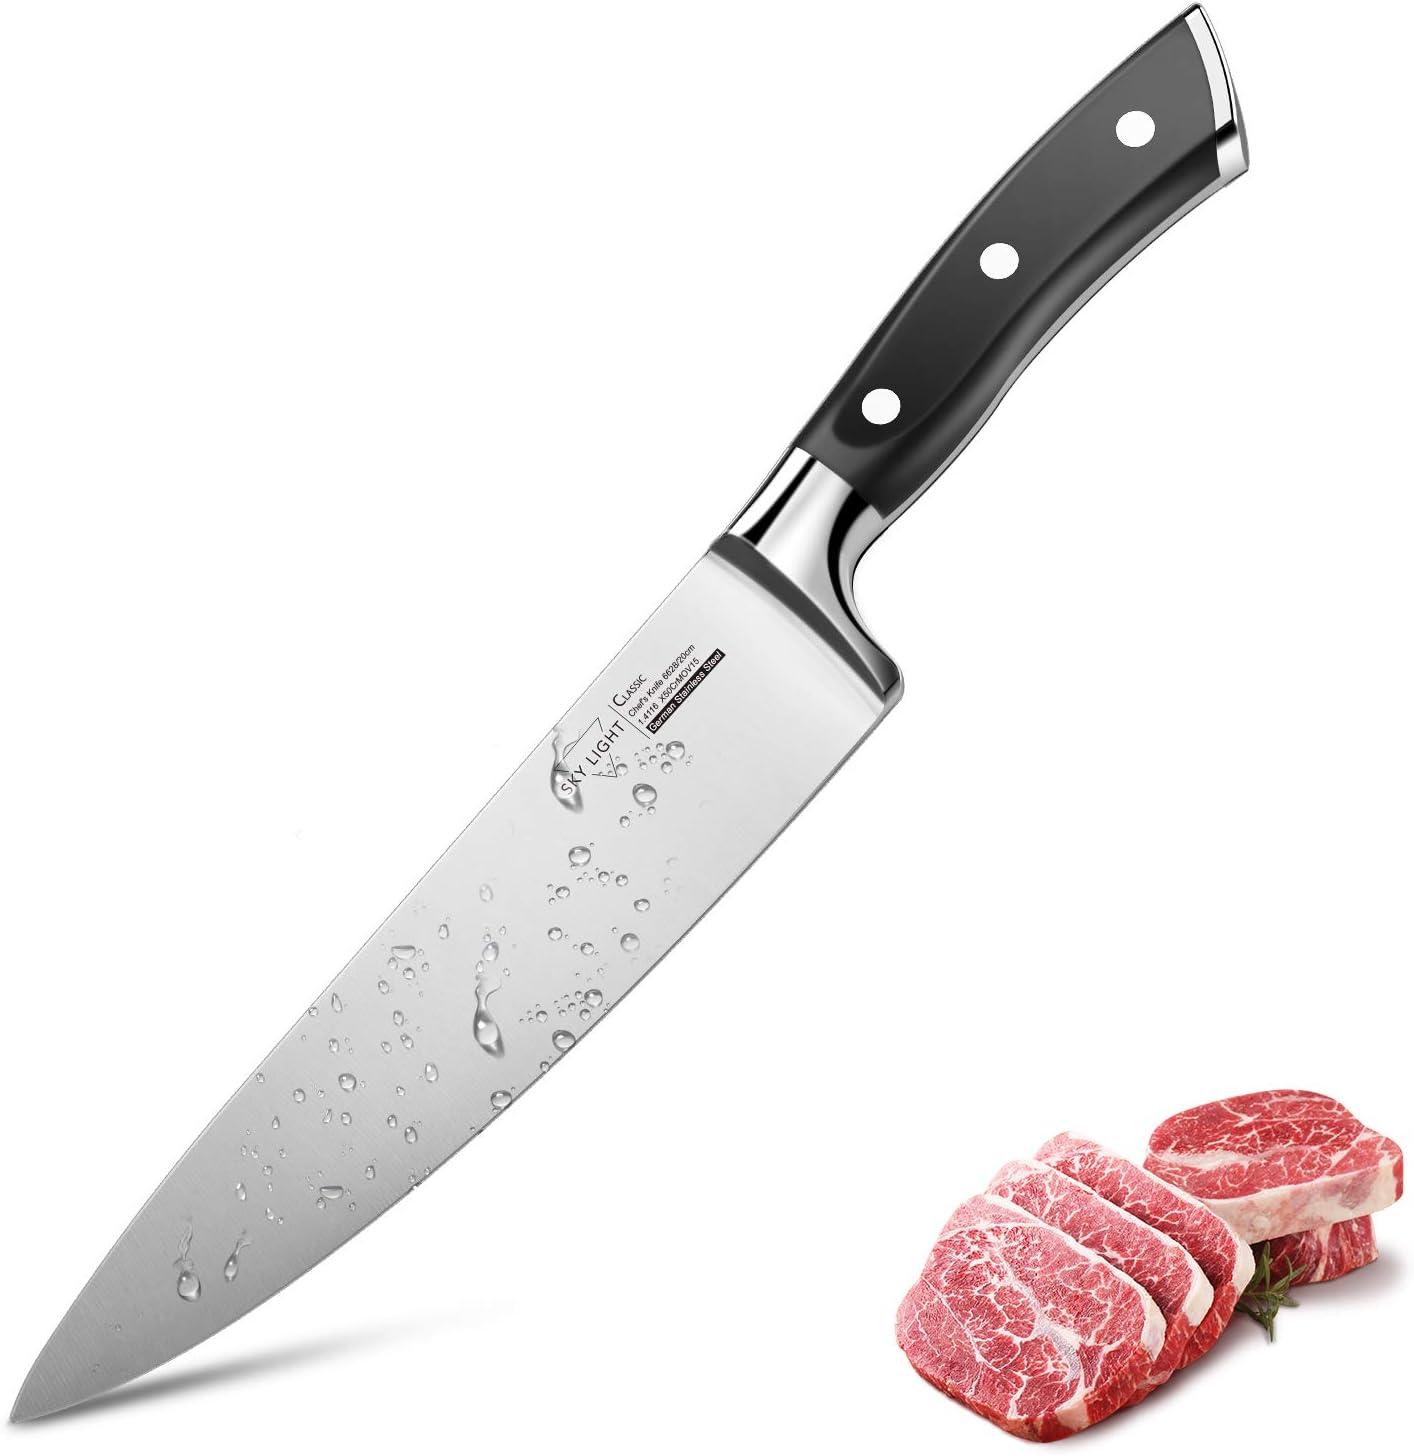 THE SKYLIGHT C-6628 CHEF KNIFE